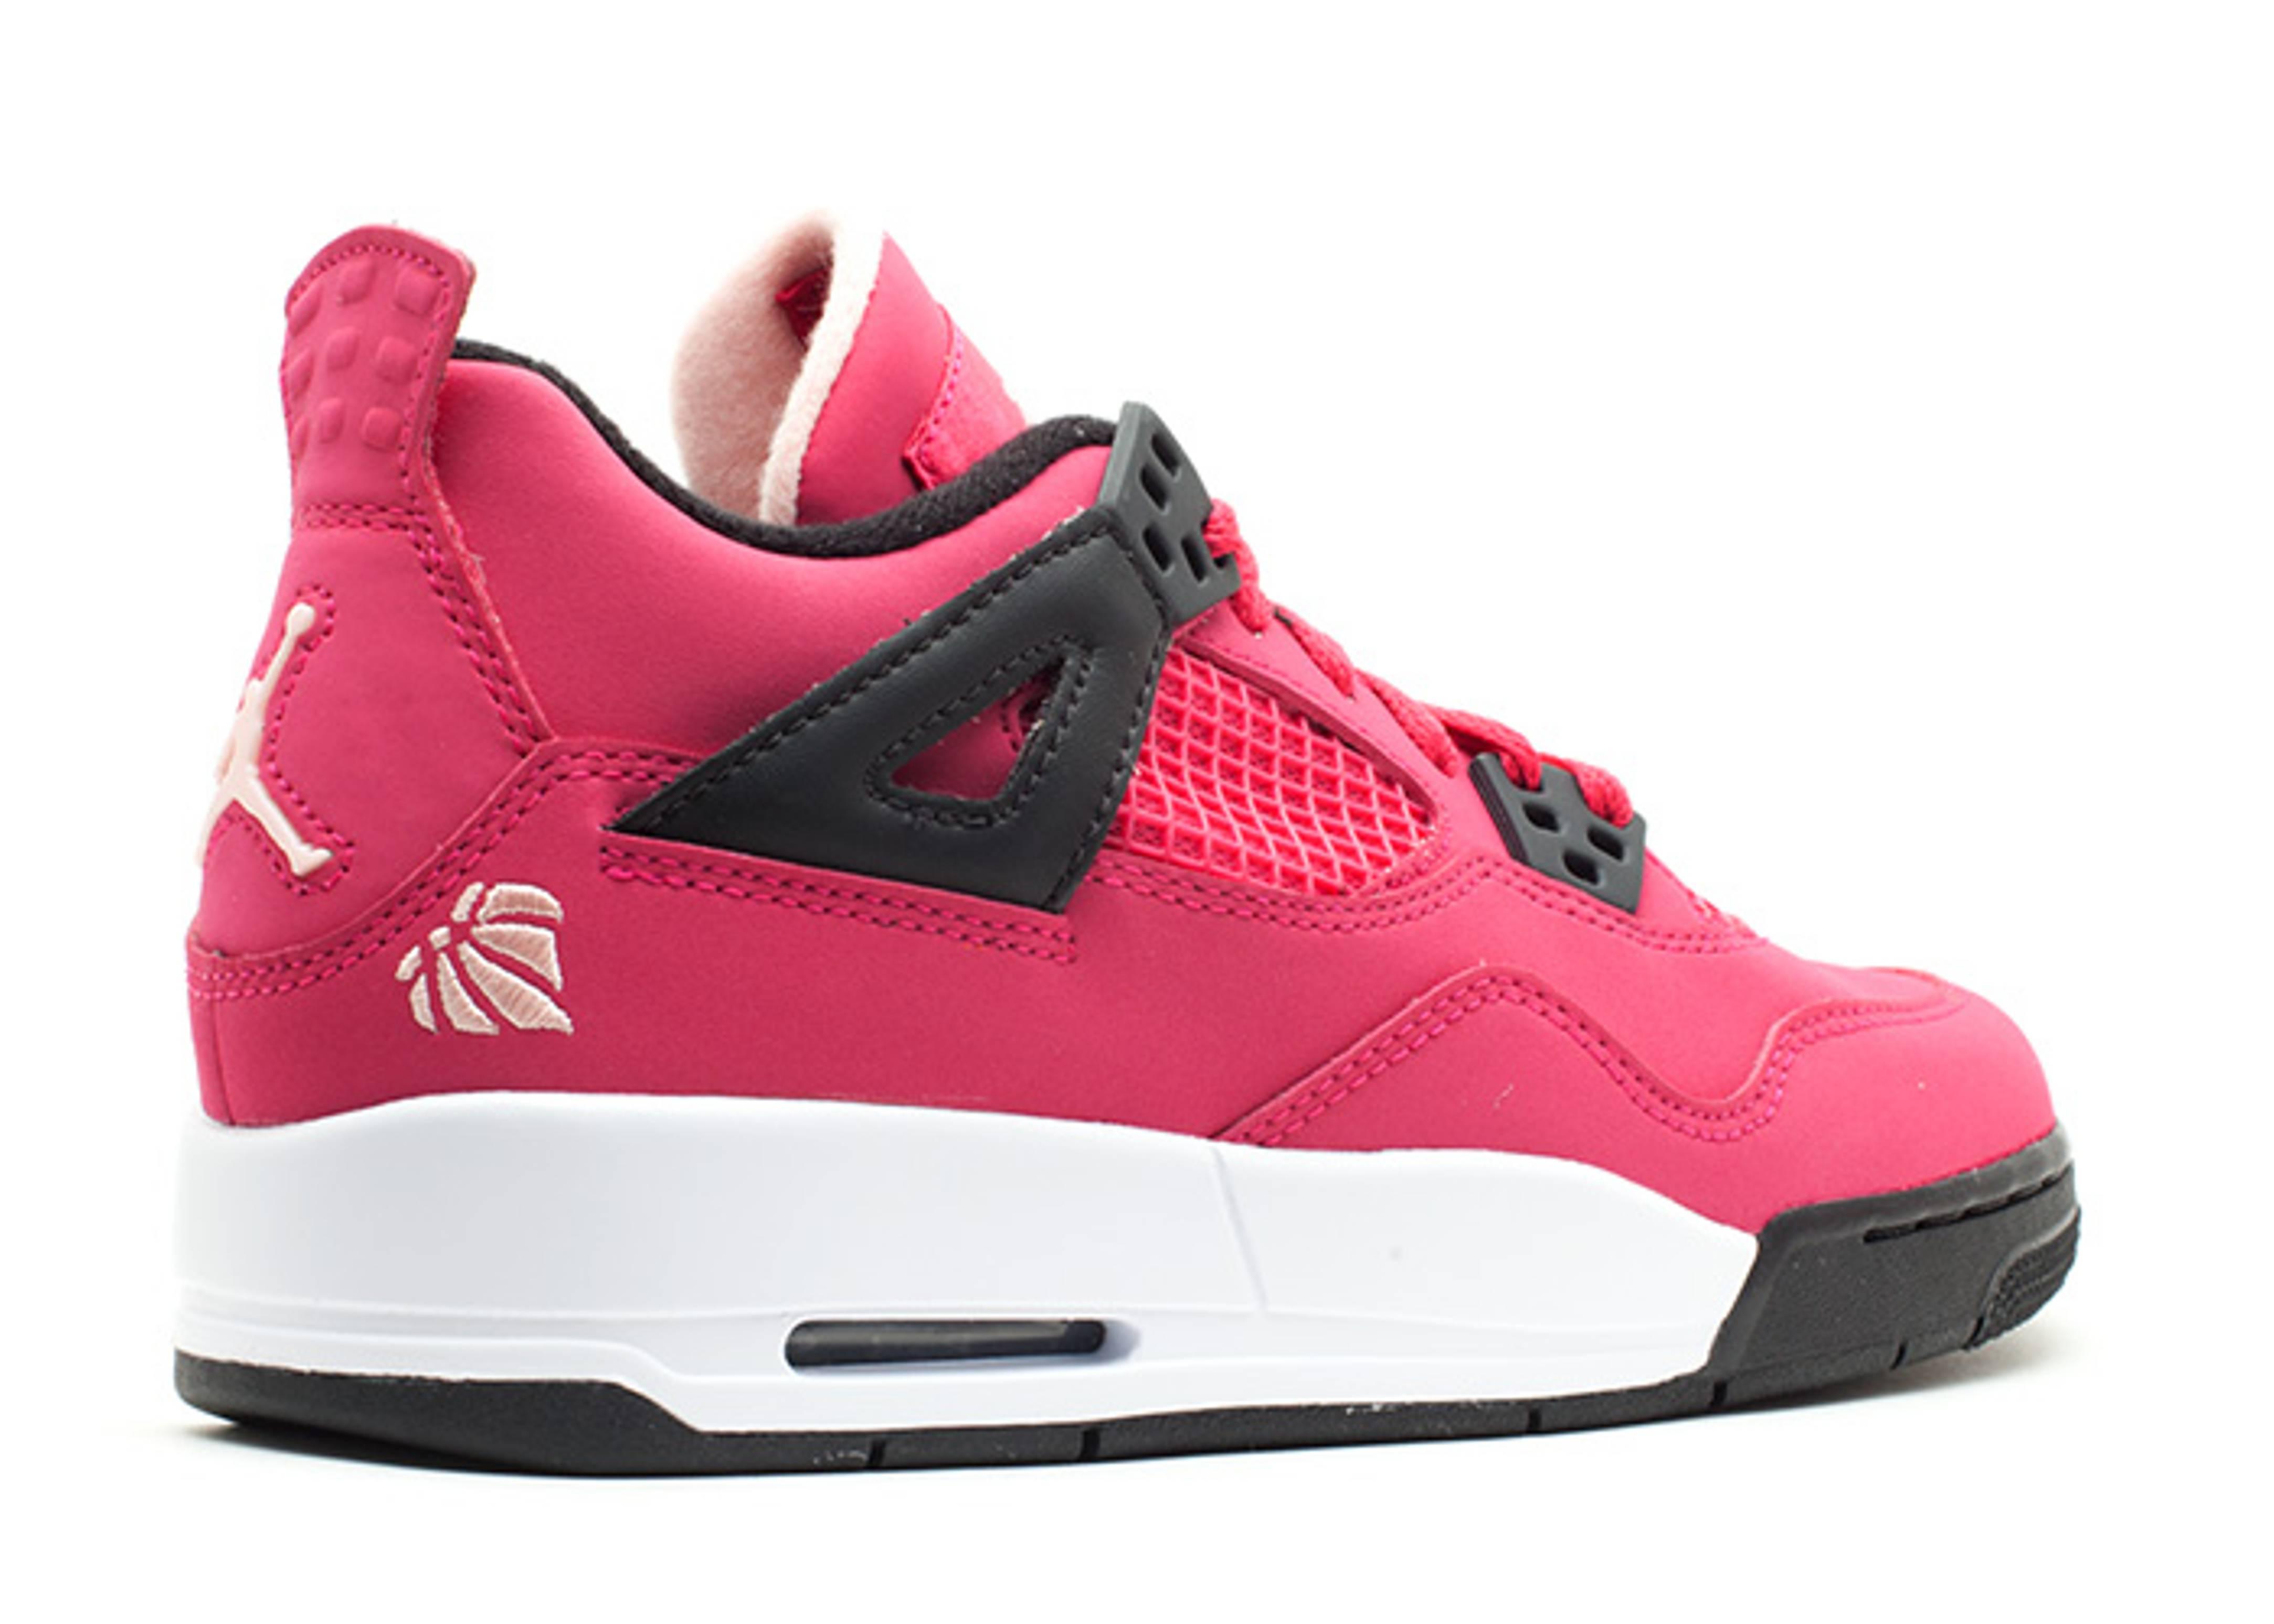 online retailer 36356 bdb96 Girls Air Jordan 4 Retro (gs) - Air Jordan - 487724 601 - voltage cherry- white-black   Flight Club